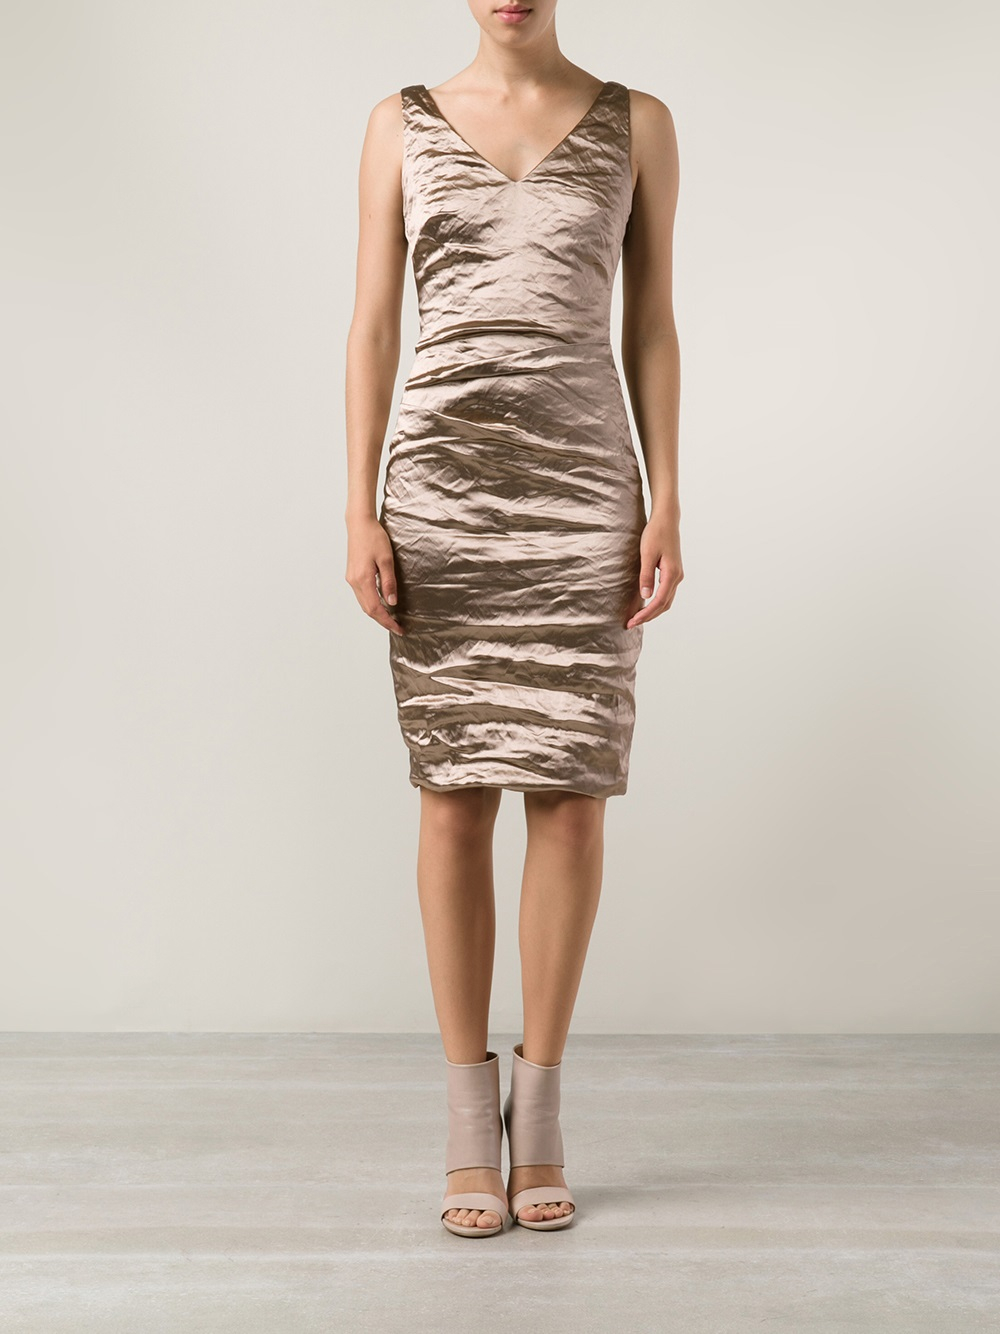 Lyst Nicole Miller Cocktail Dress In Metallic